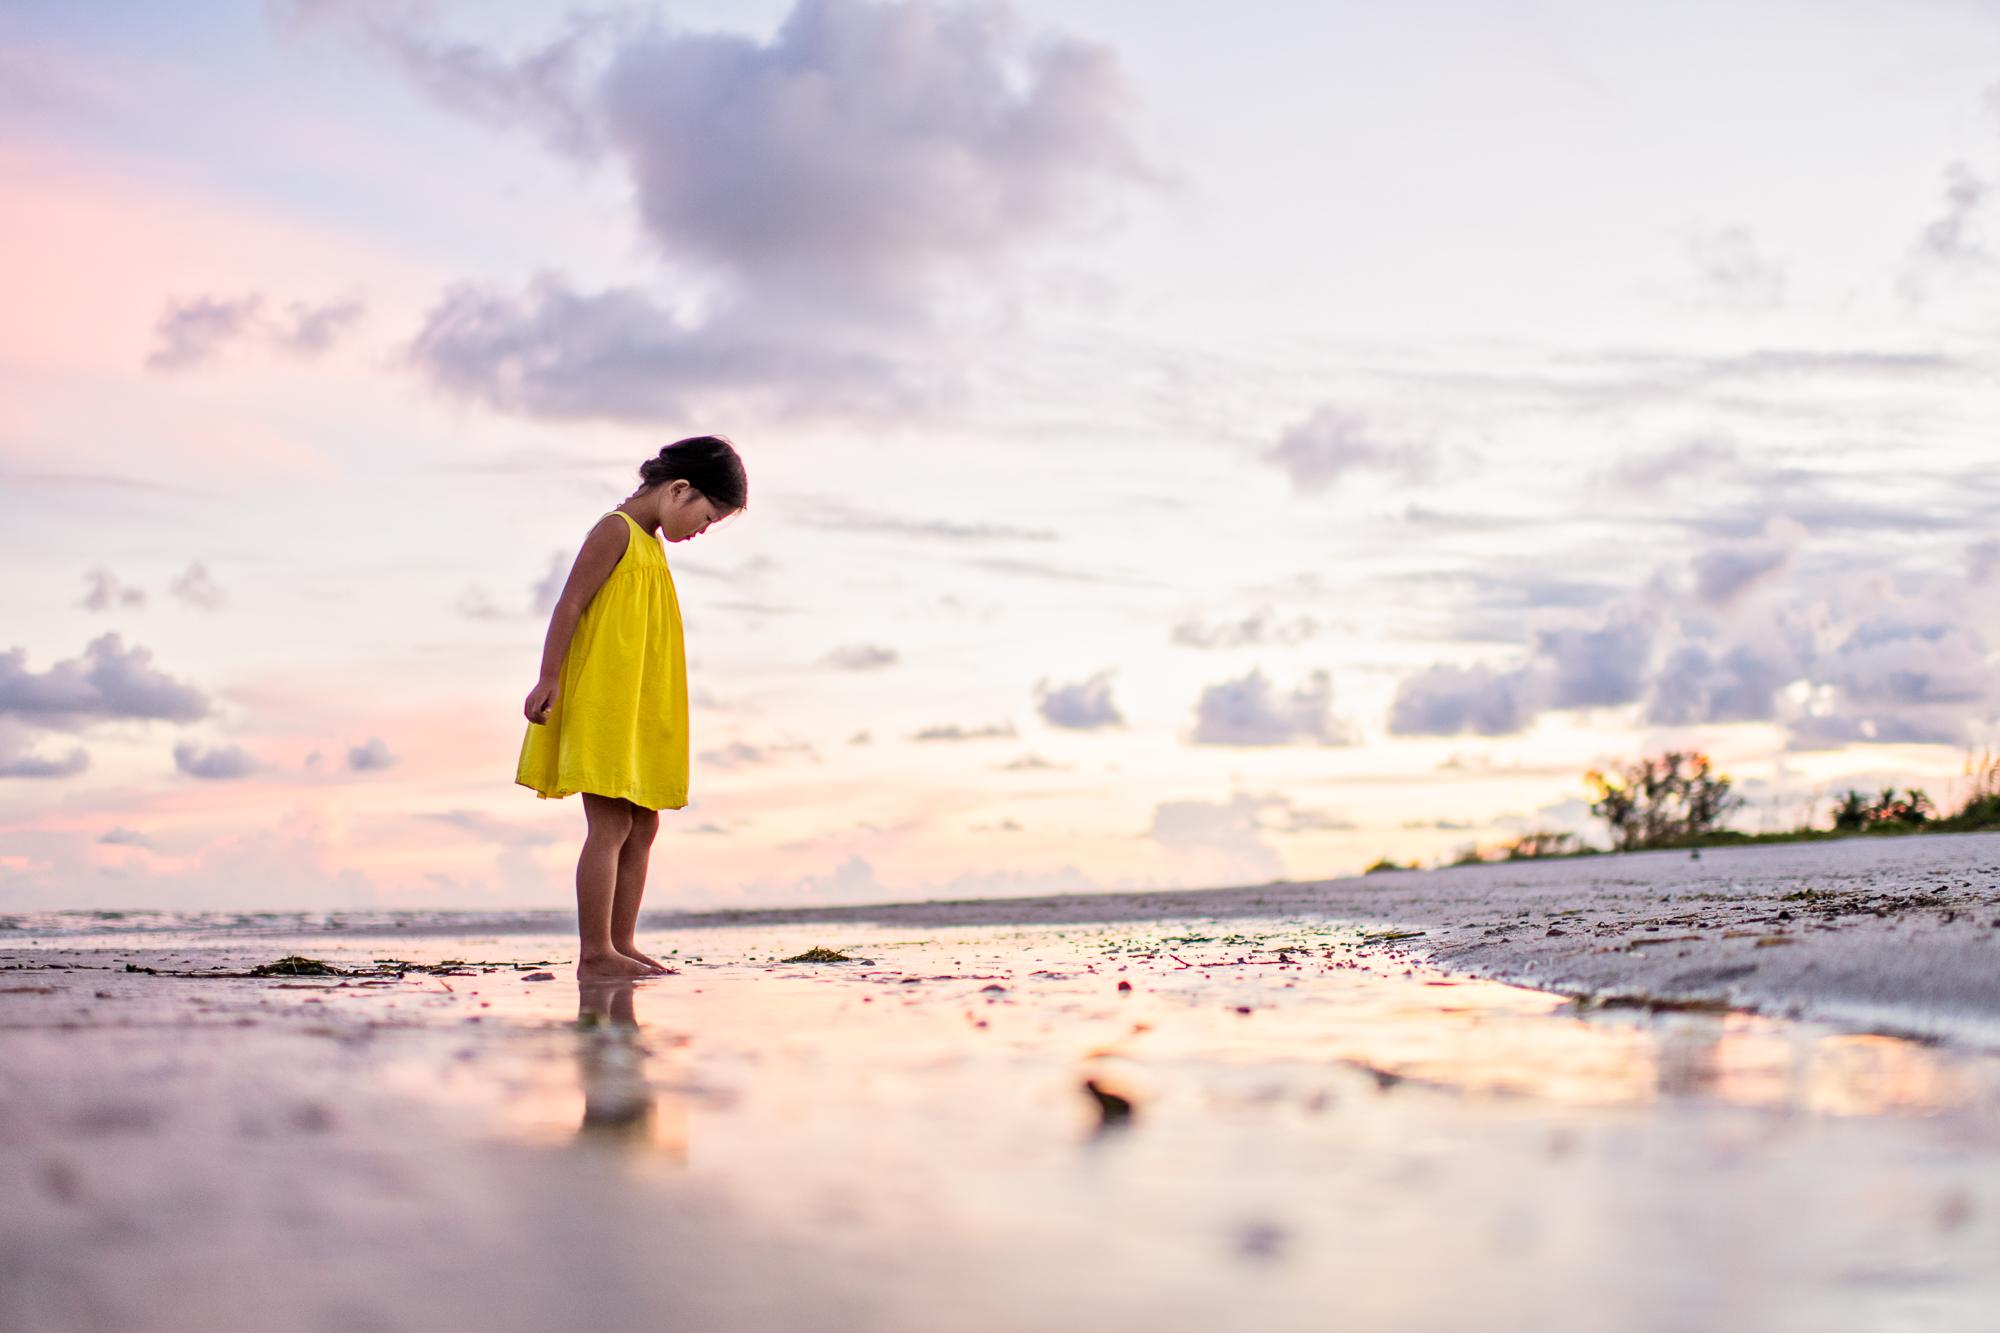 sanibel-island-beach-golden-3.jpg